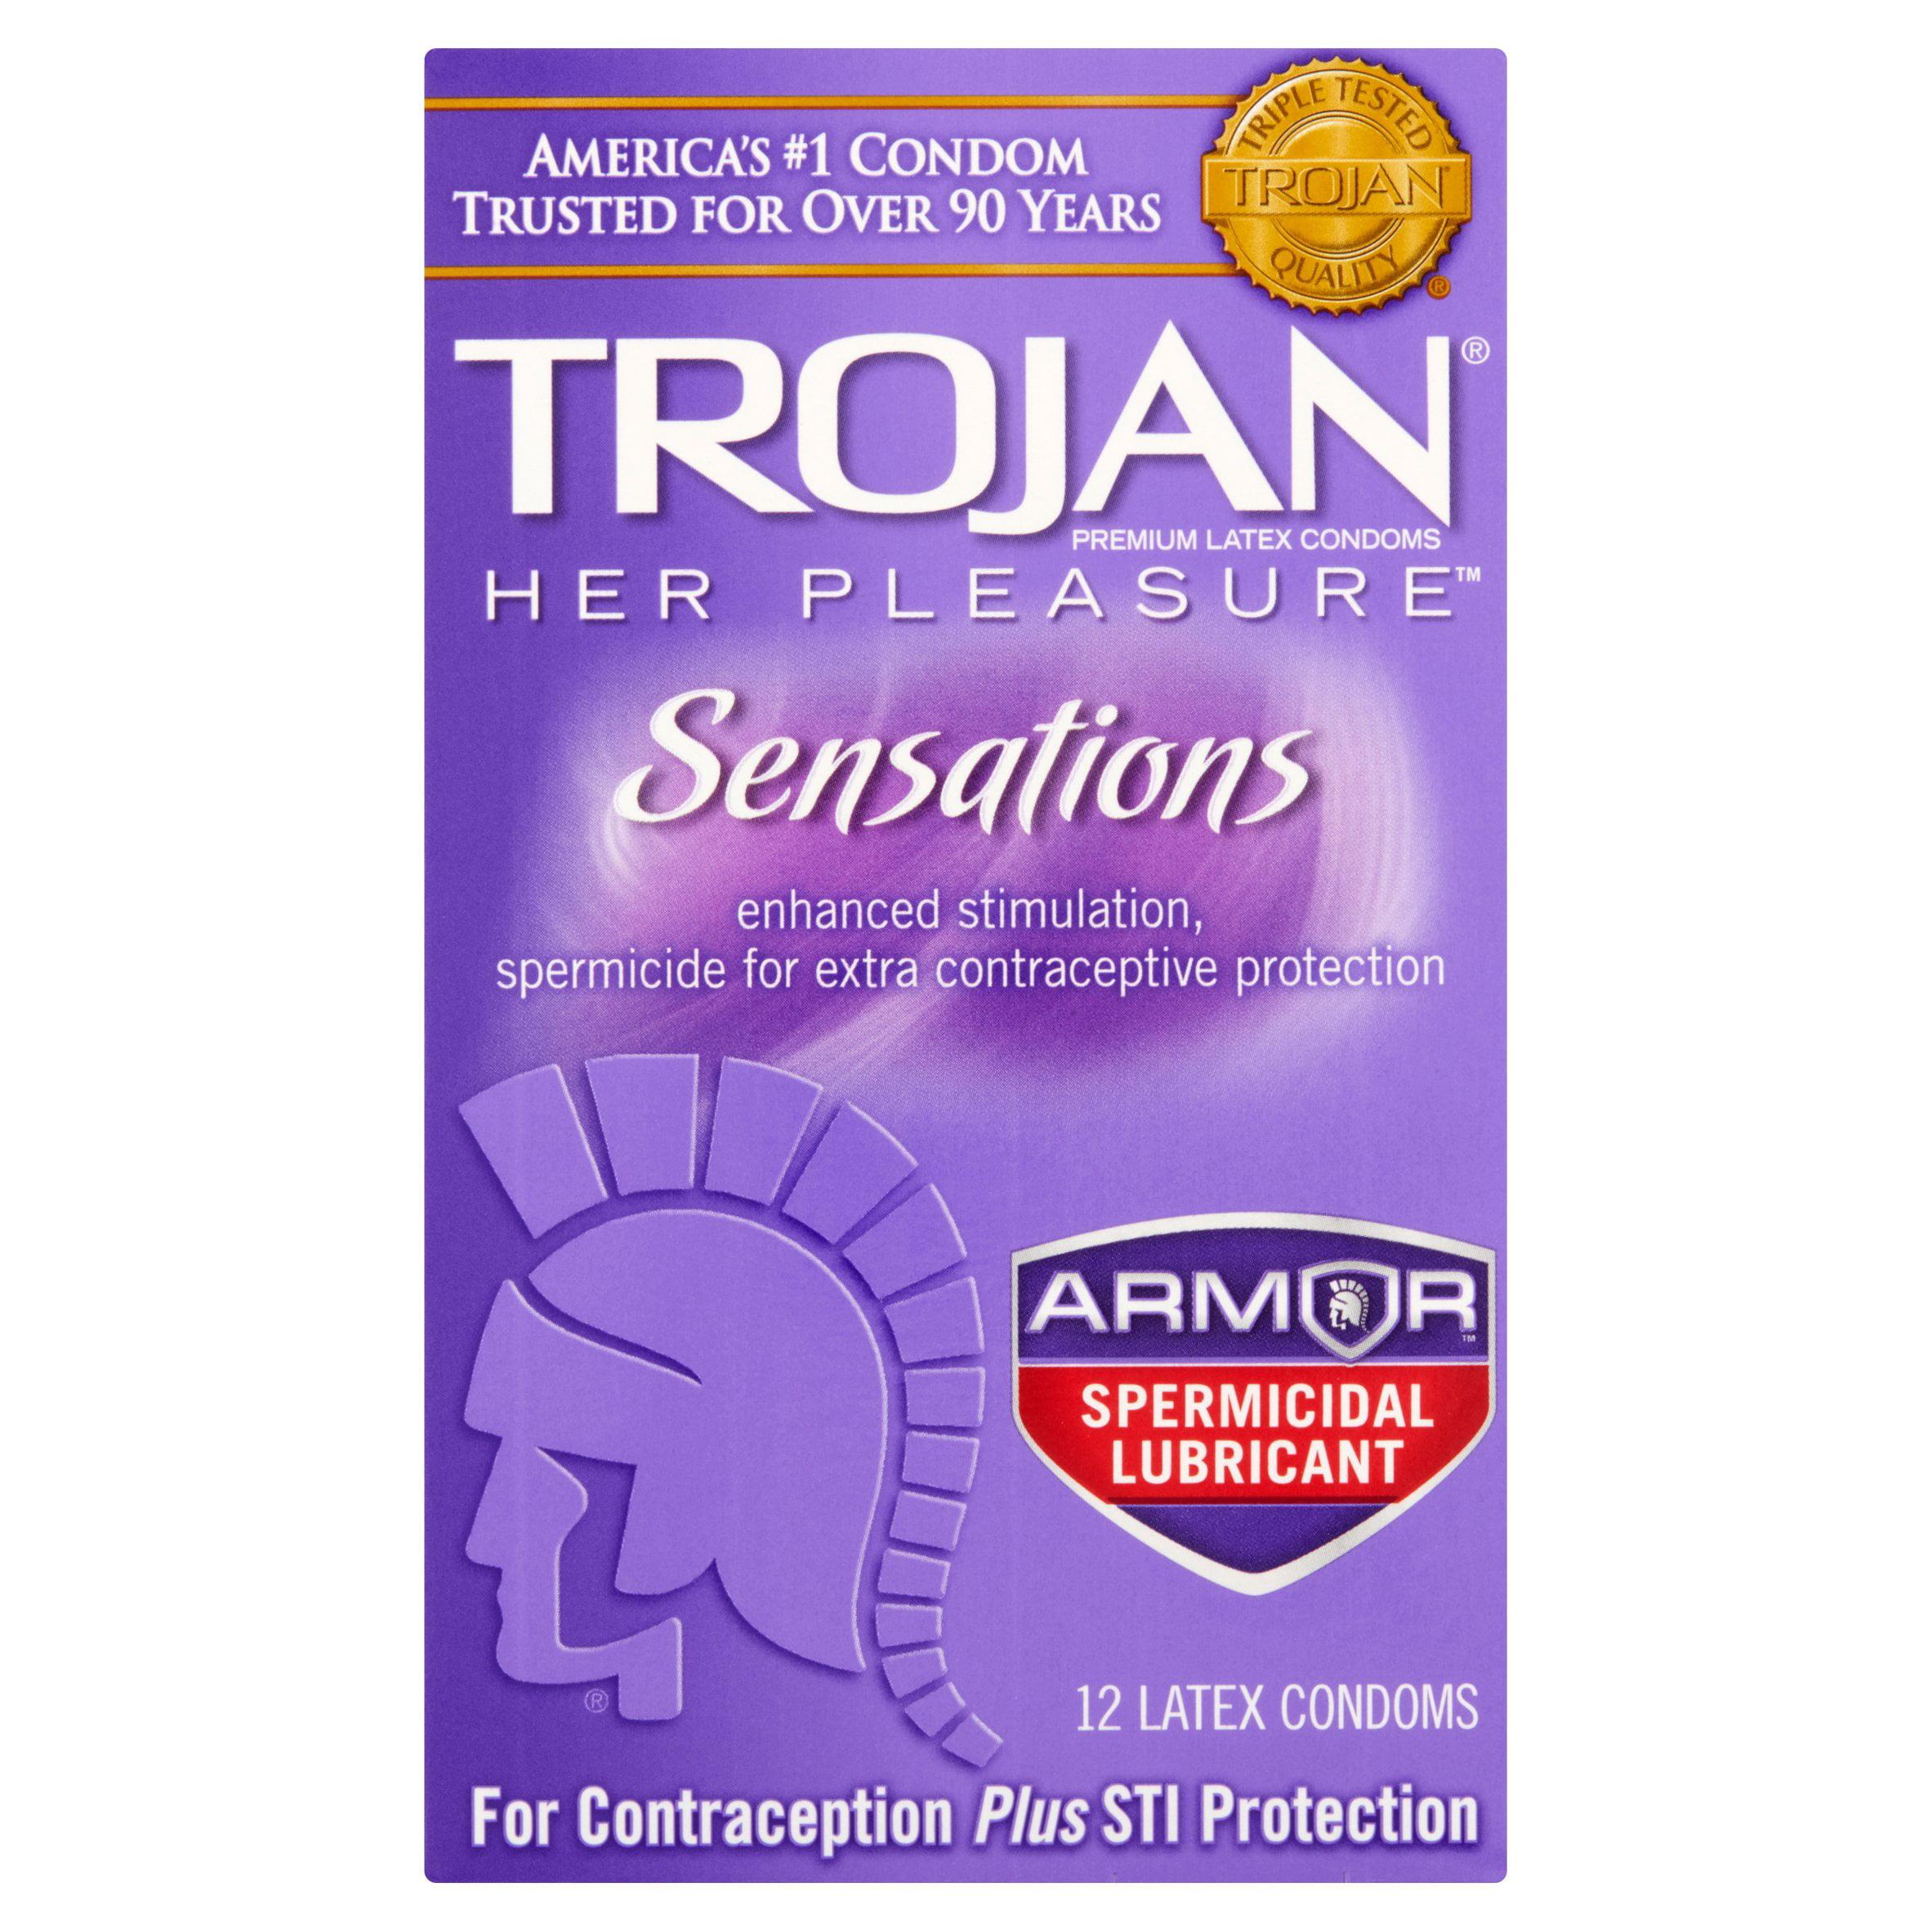 Trojan Her Pleasure Sensations With Spermacide Lubricated Latex Condoms - 12 ct